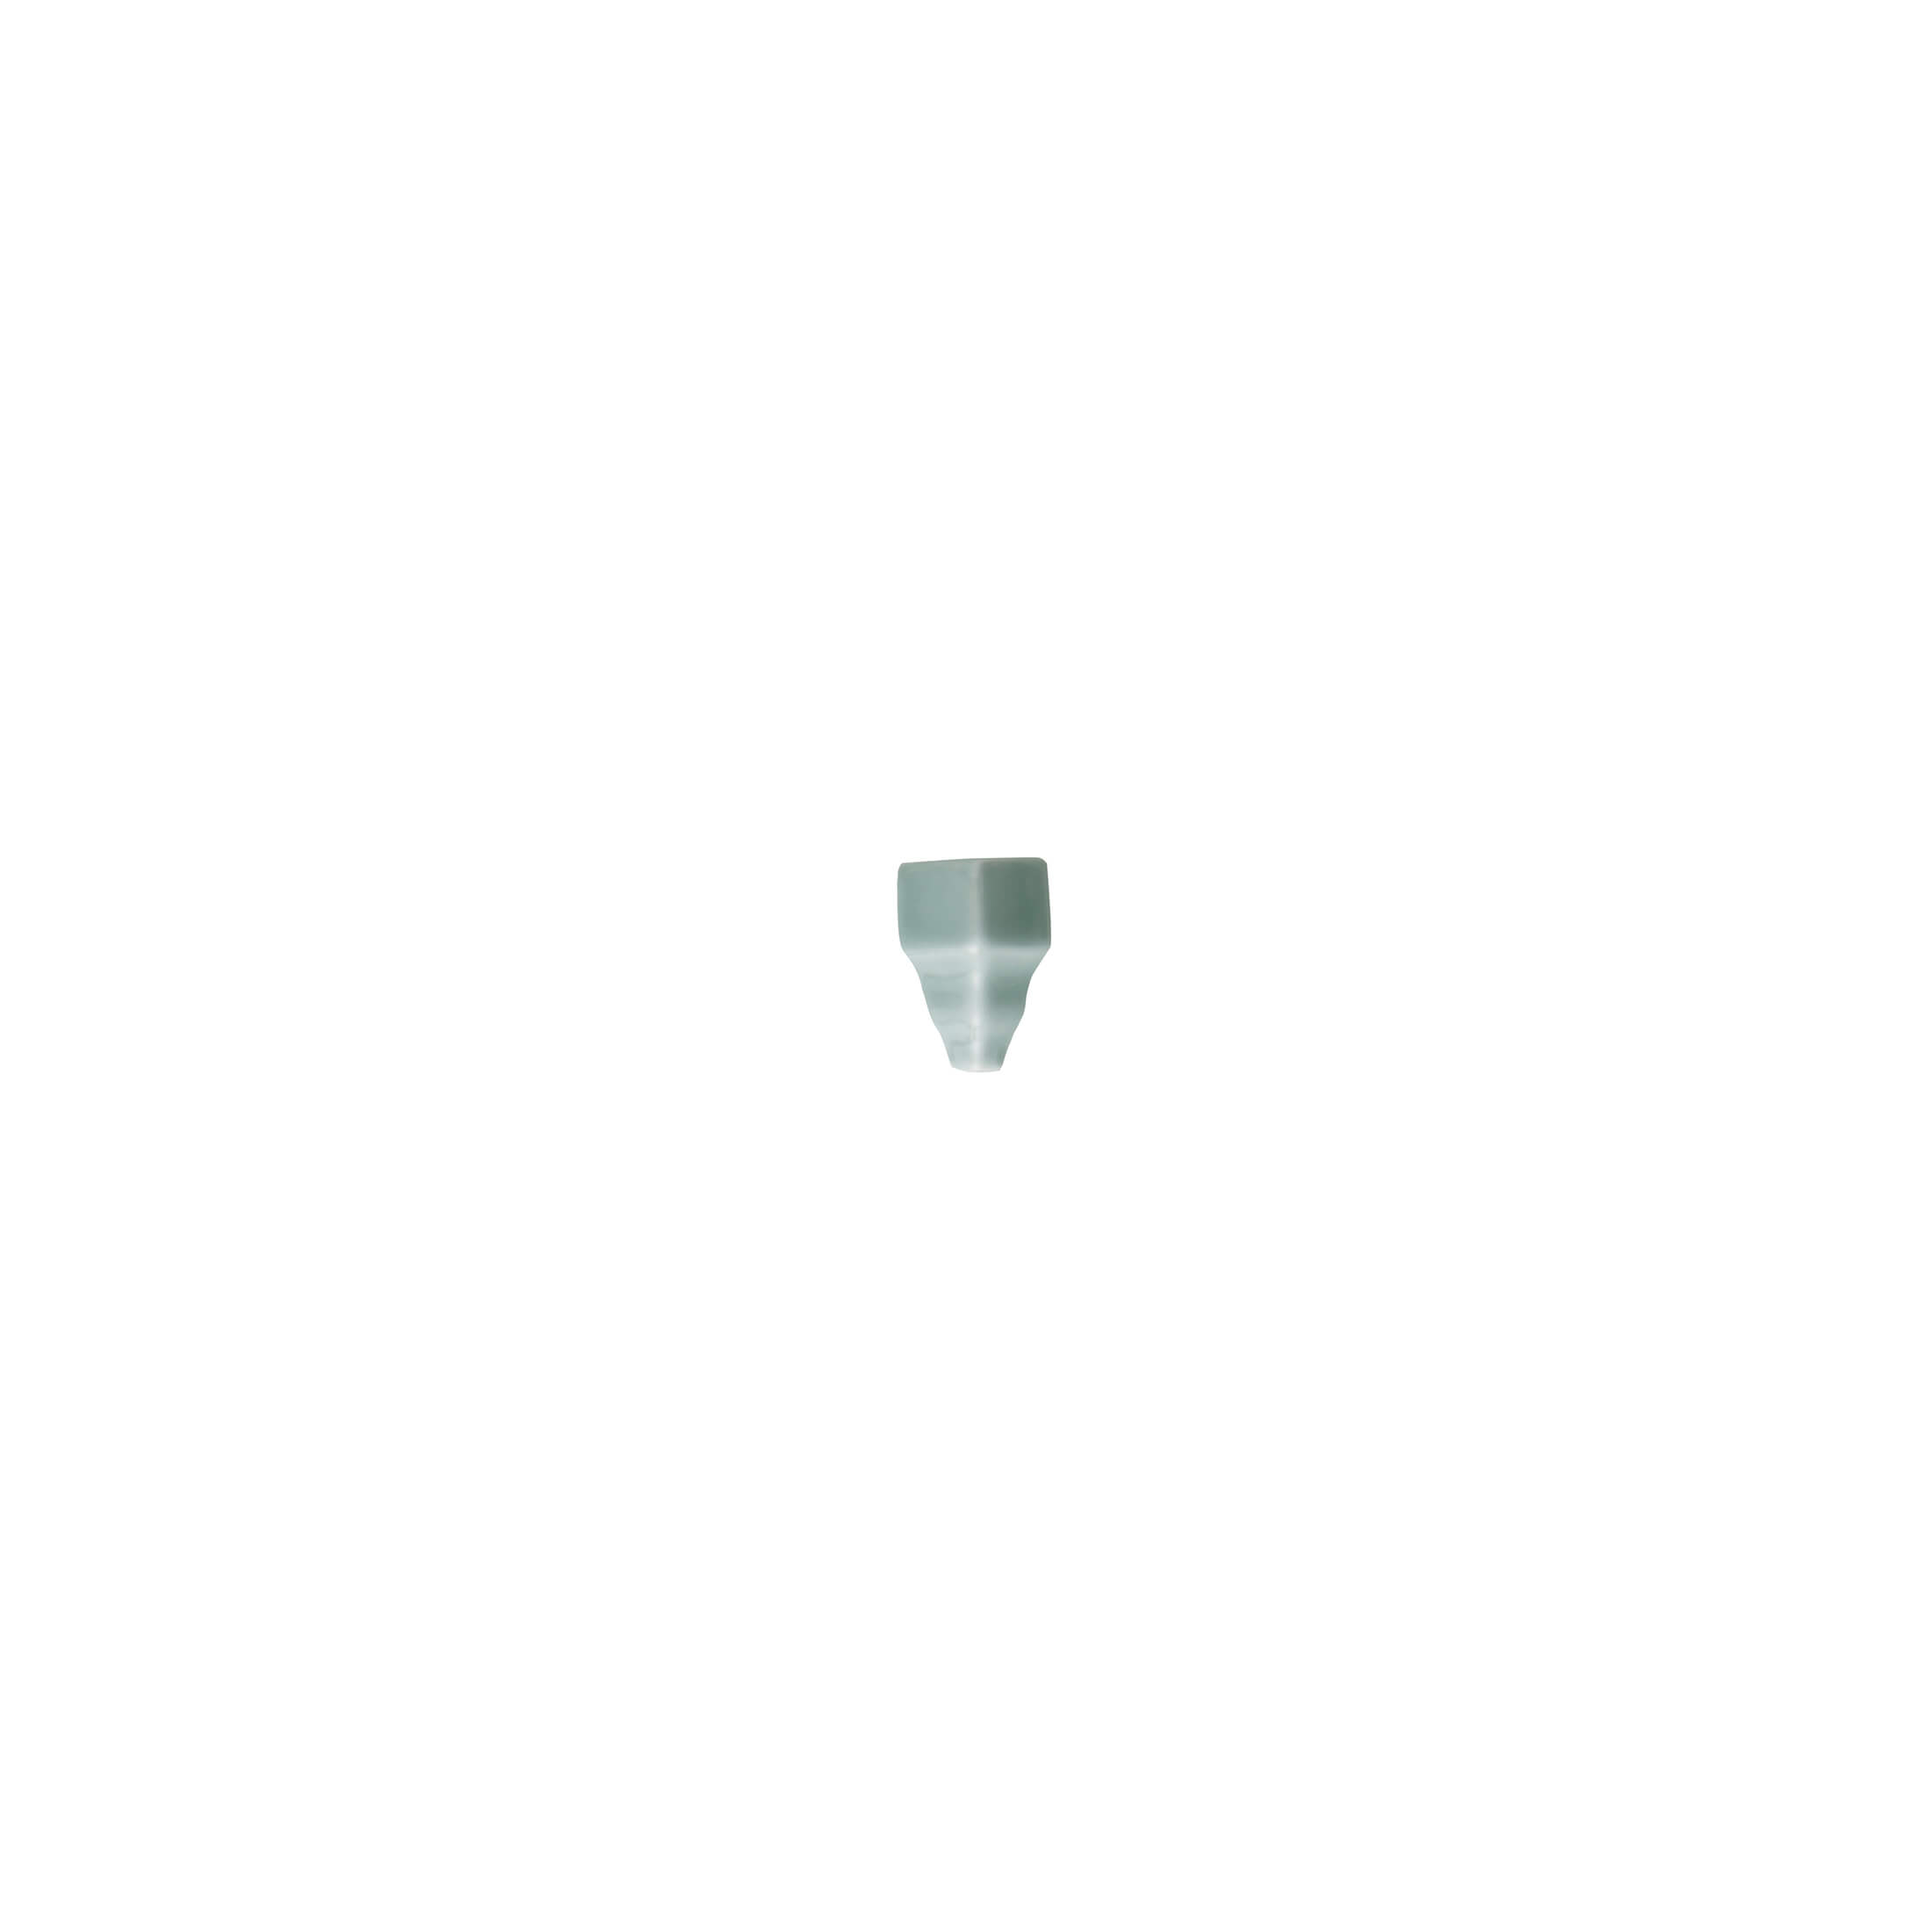 ADNE5625 - ANGULO EXTERIOR CORNISACLASICA - 3.5 cm X 15 cm